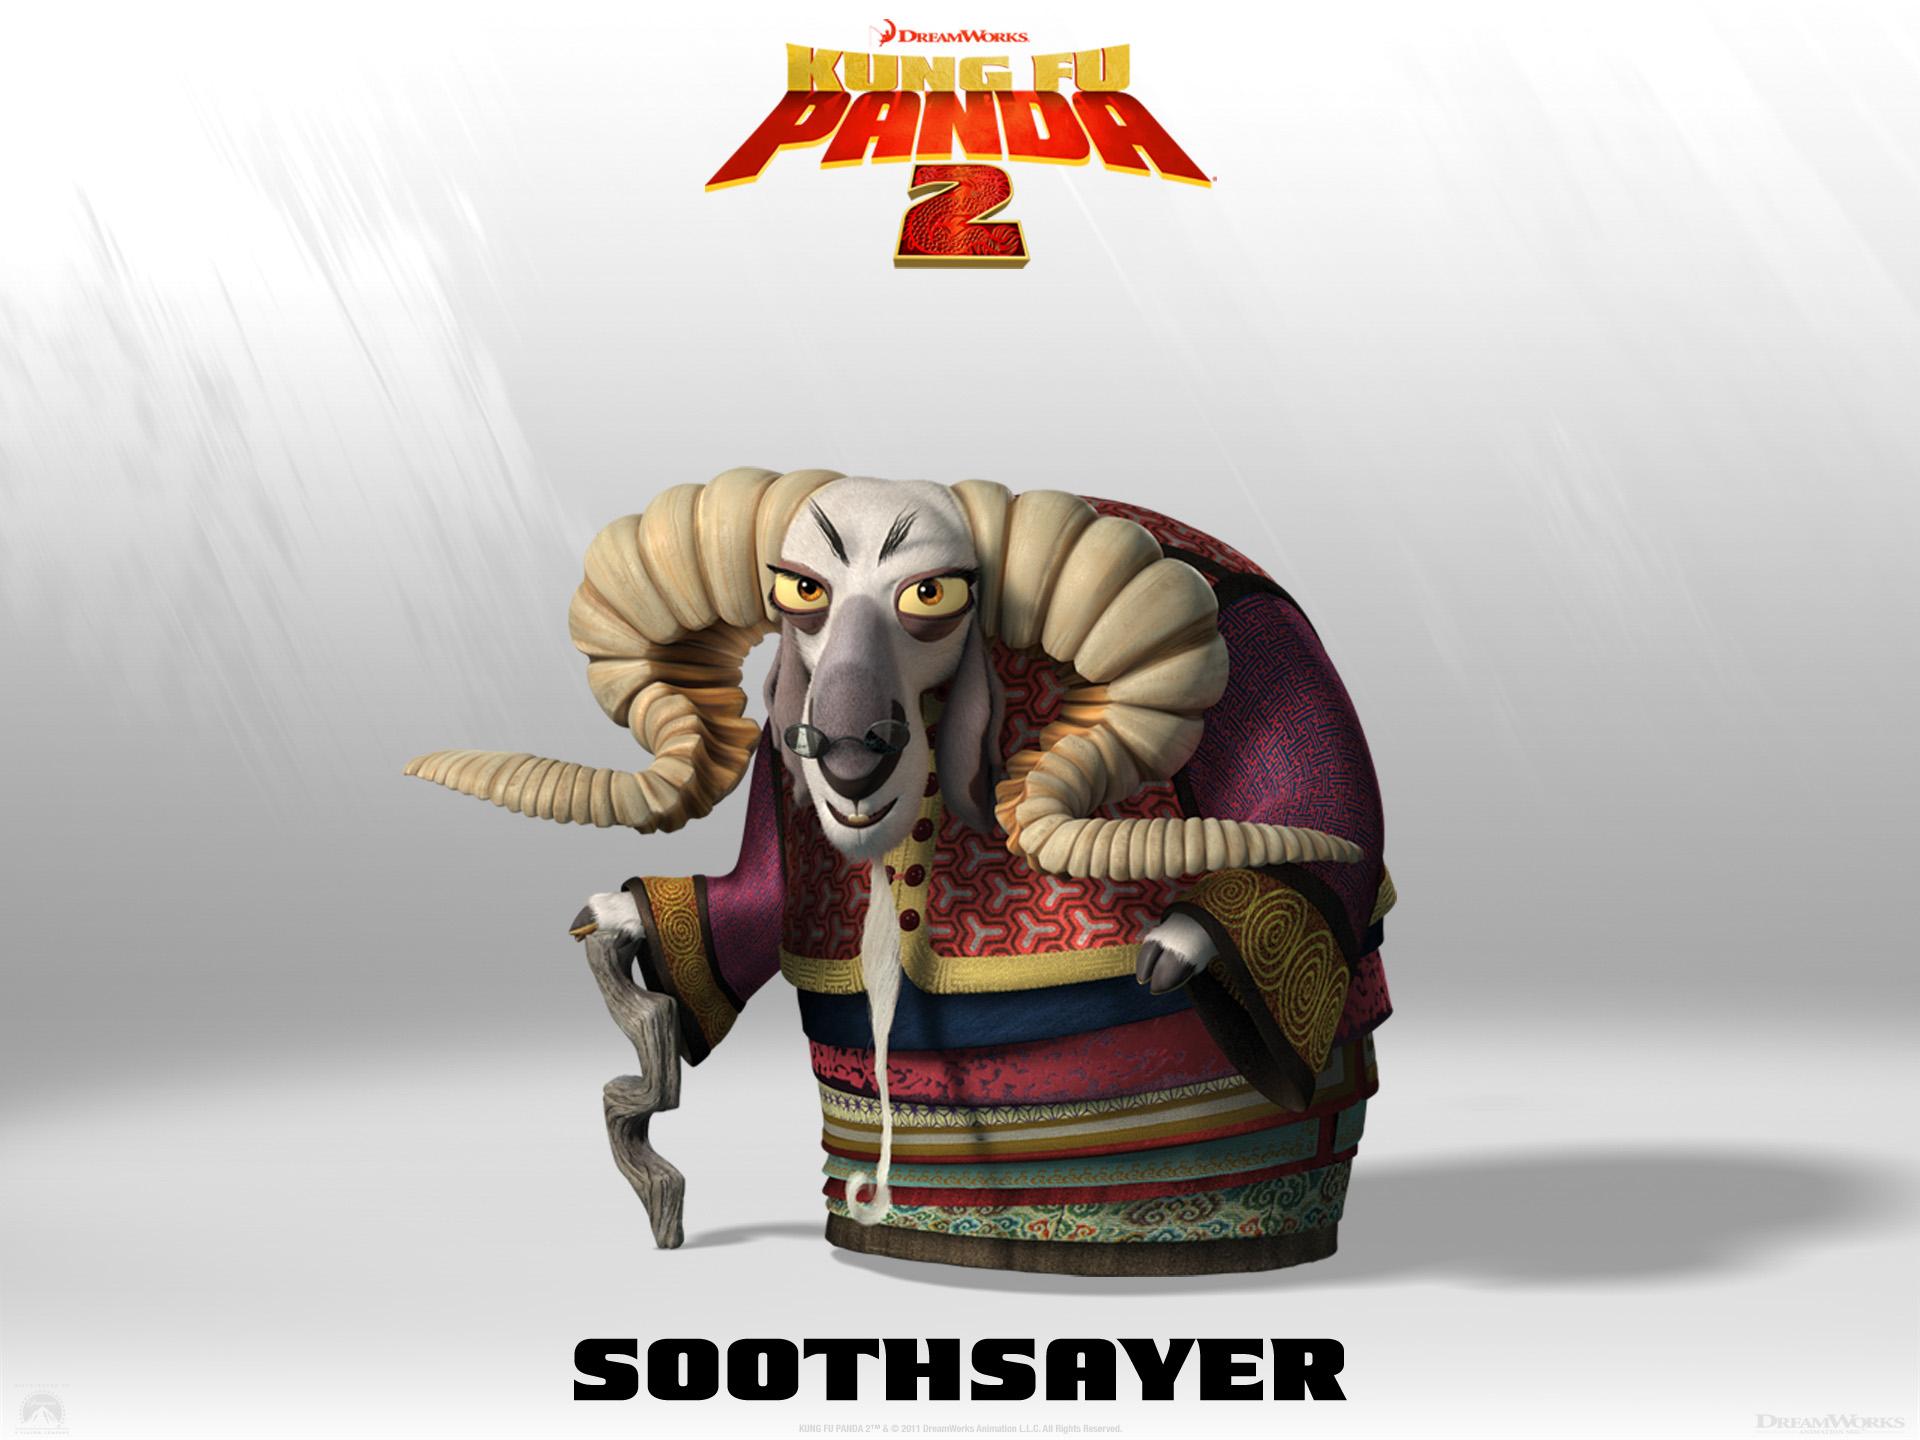 Wallpaper Kung Fu PANDA 2 Soothsayer Cinema Video